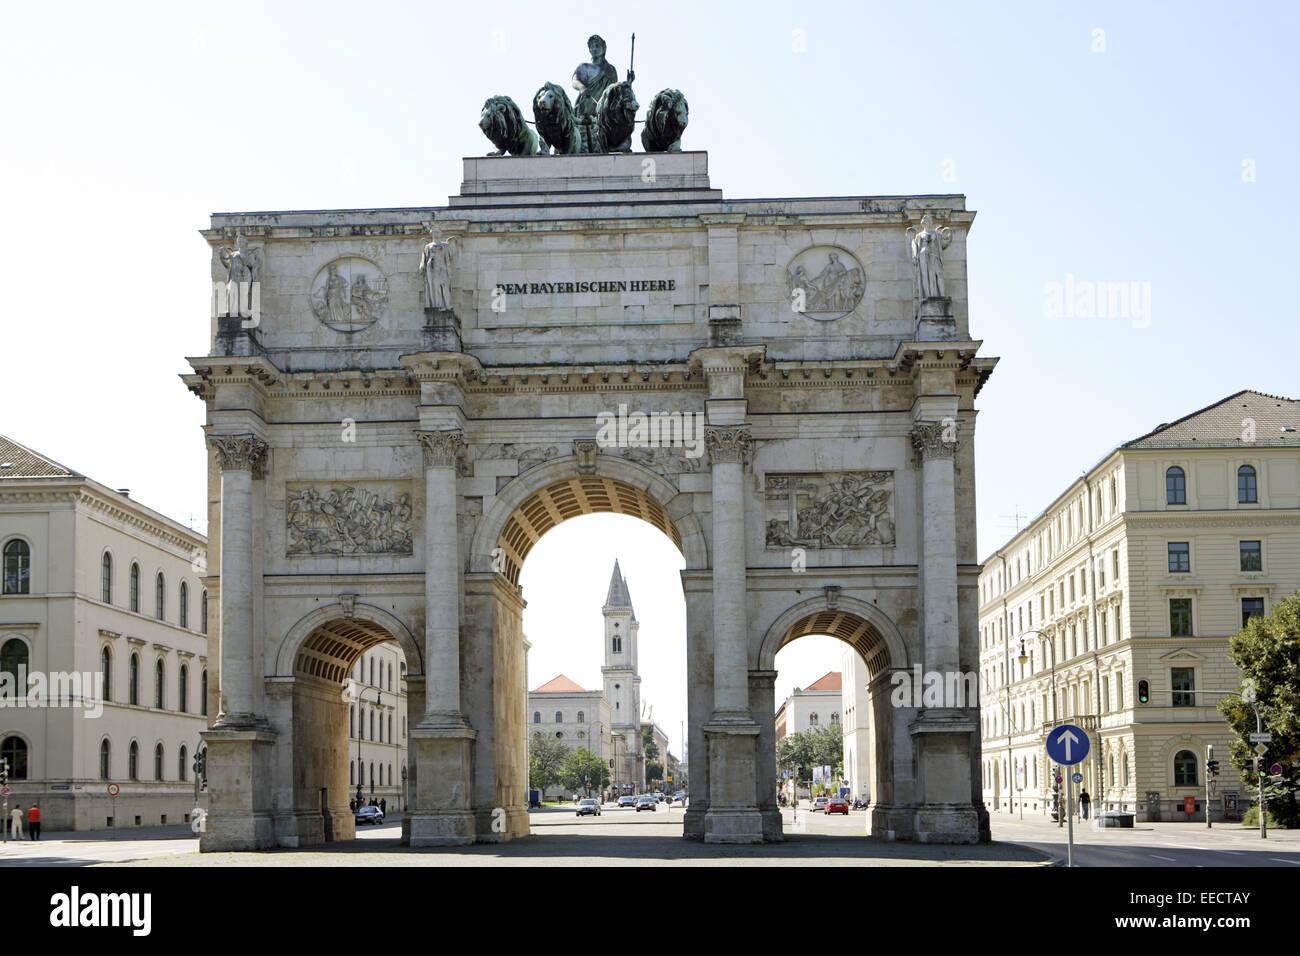 Architektur, Bauwerk, Bauwerke, Bayern, Boegen, Bogen, Bögen, Deutschland, Gebaeude, Gebäude, Muenchen, - Stock Image